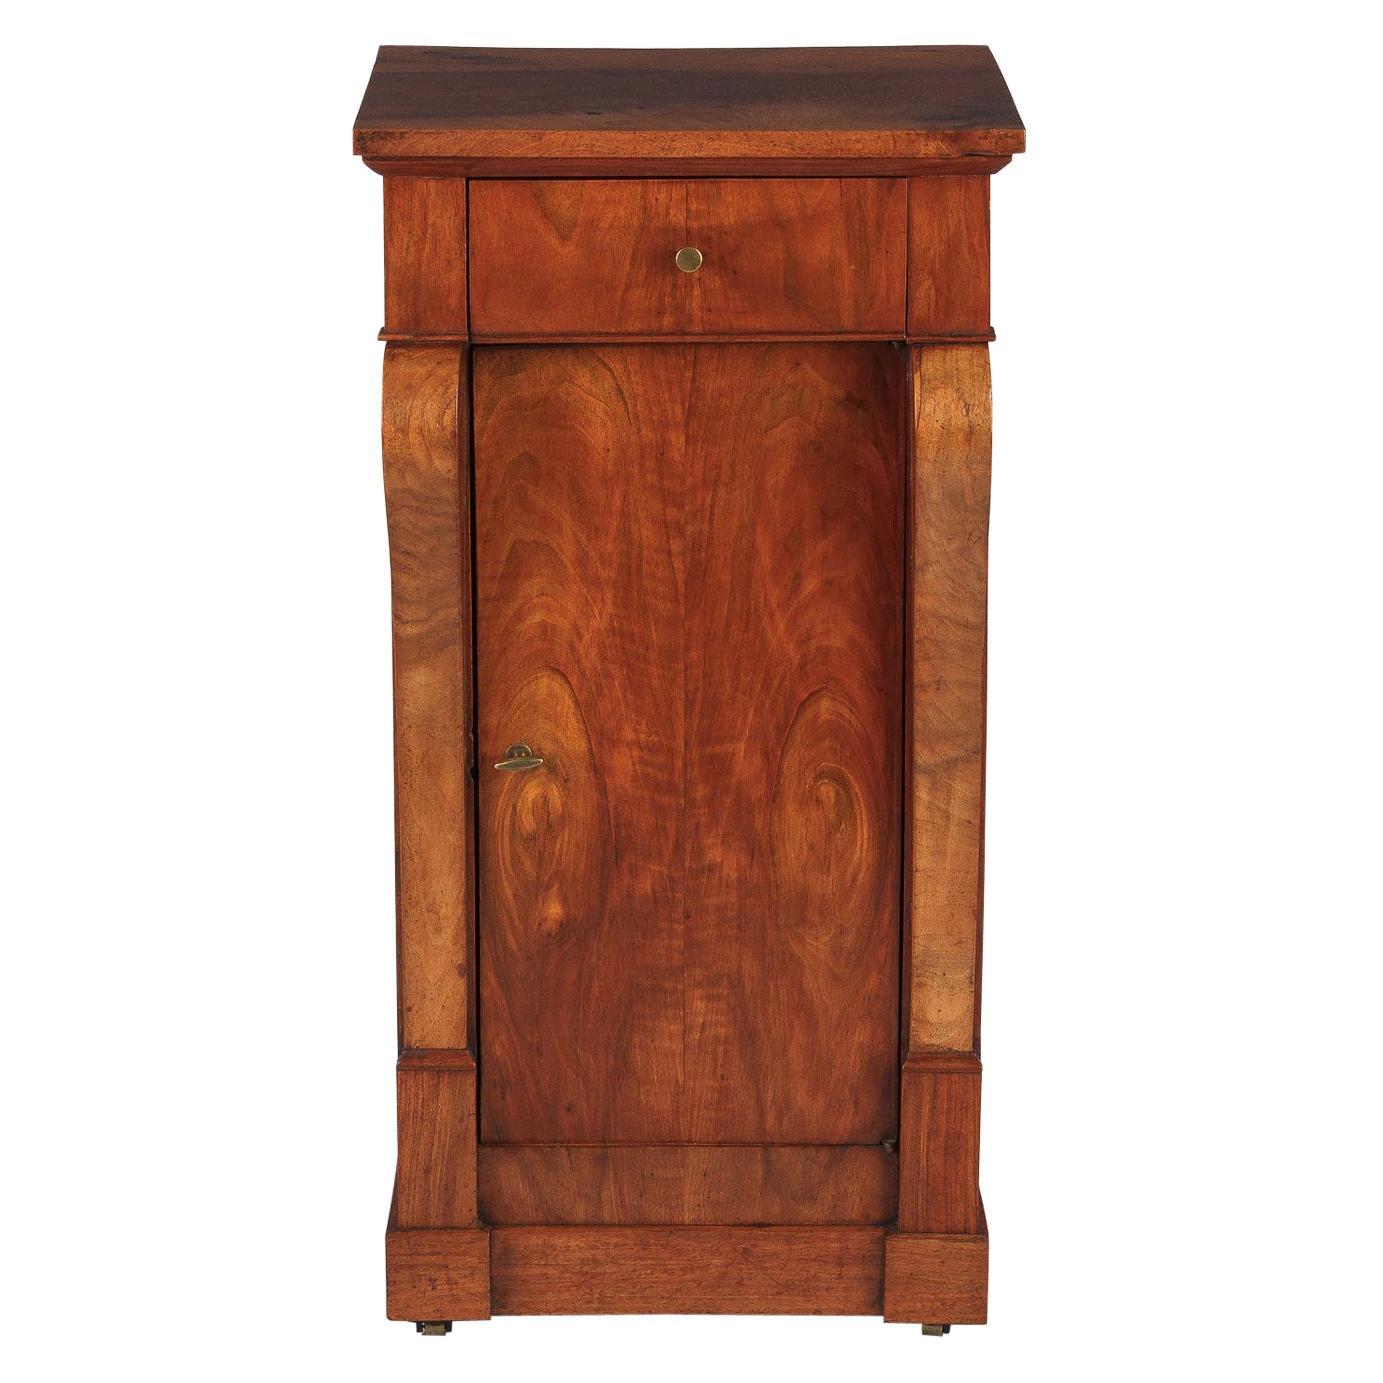 French Restoration Period Walnut Bedside Cabinet, 1820s